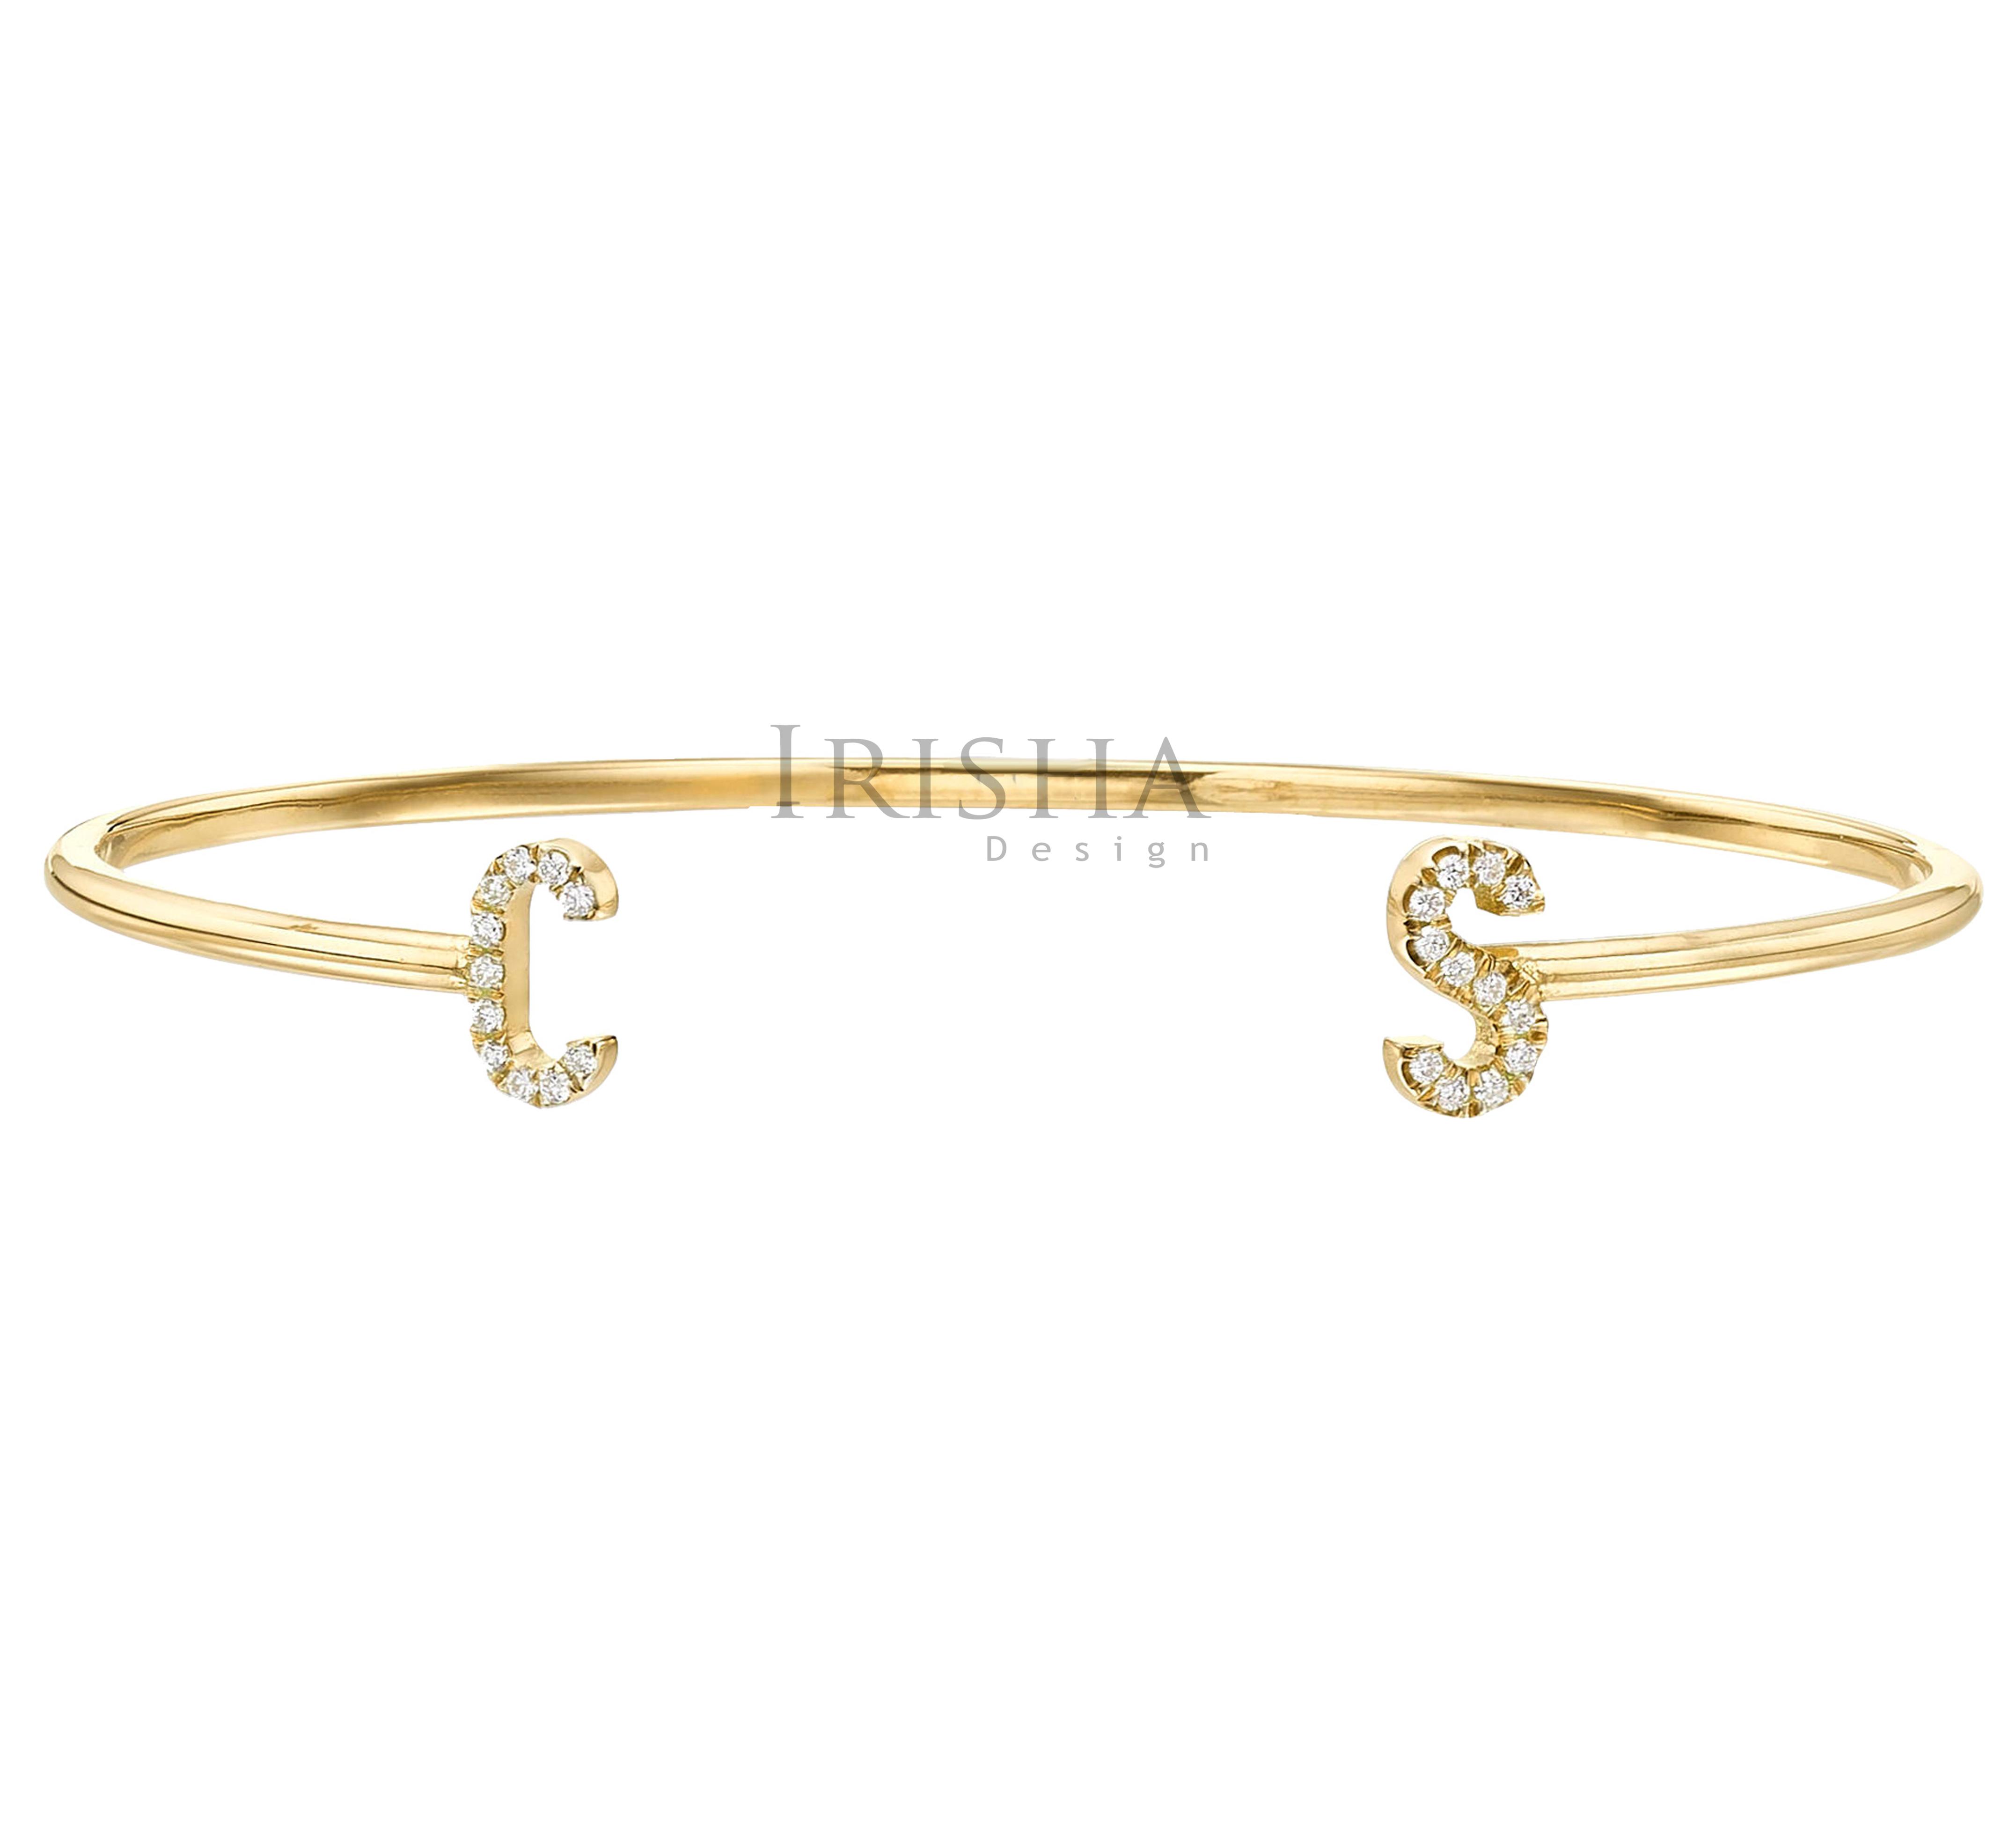 14K Gold 0.12 Ct. Genuine Diamond Initial C-S Alphabet Cuff Bangle Bracelet